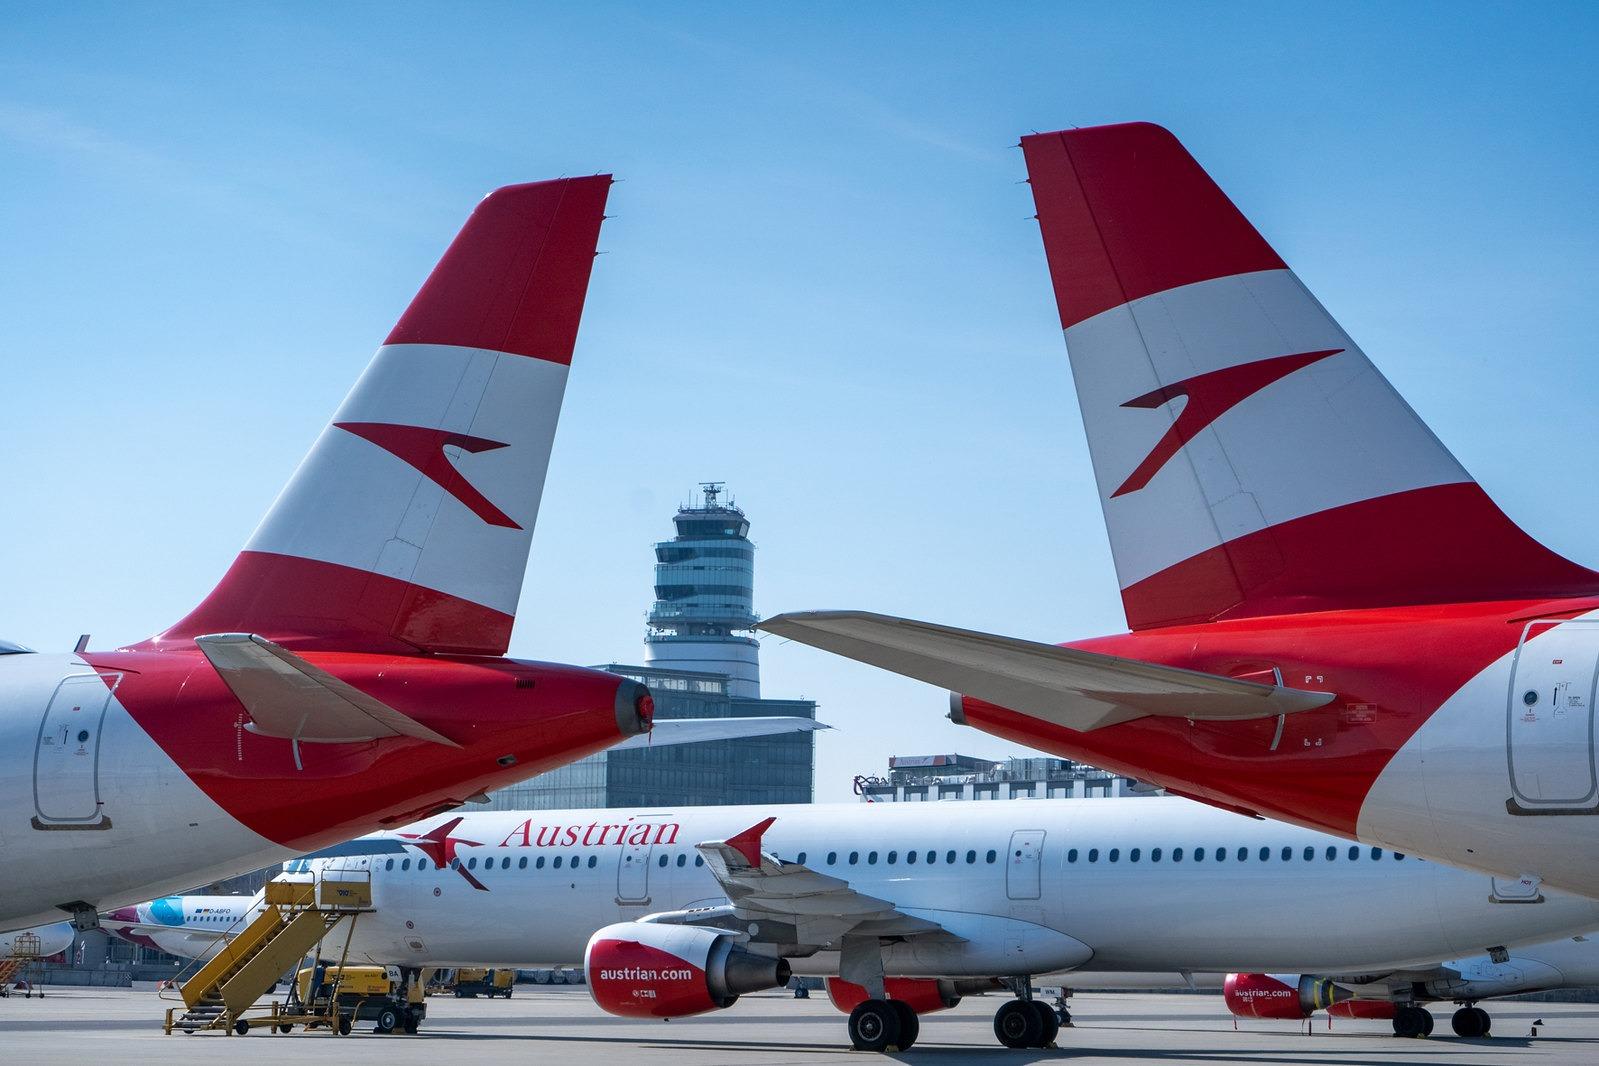 zboruri-viena-bucuresti-austrian-airlines-18-iunie-2020